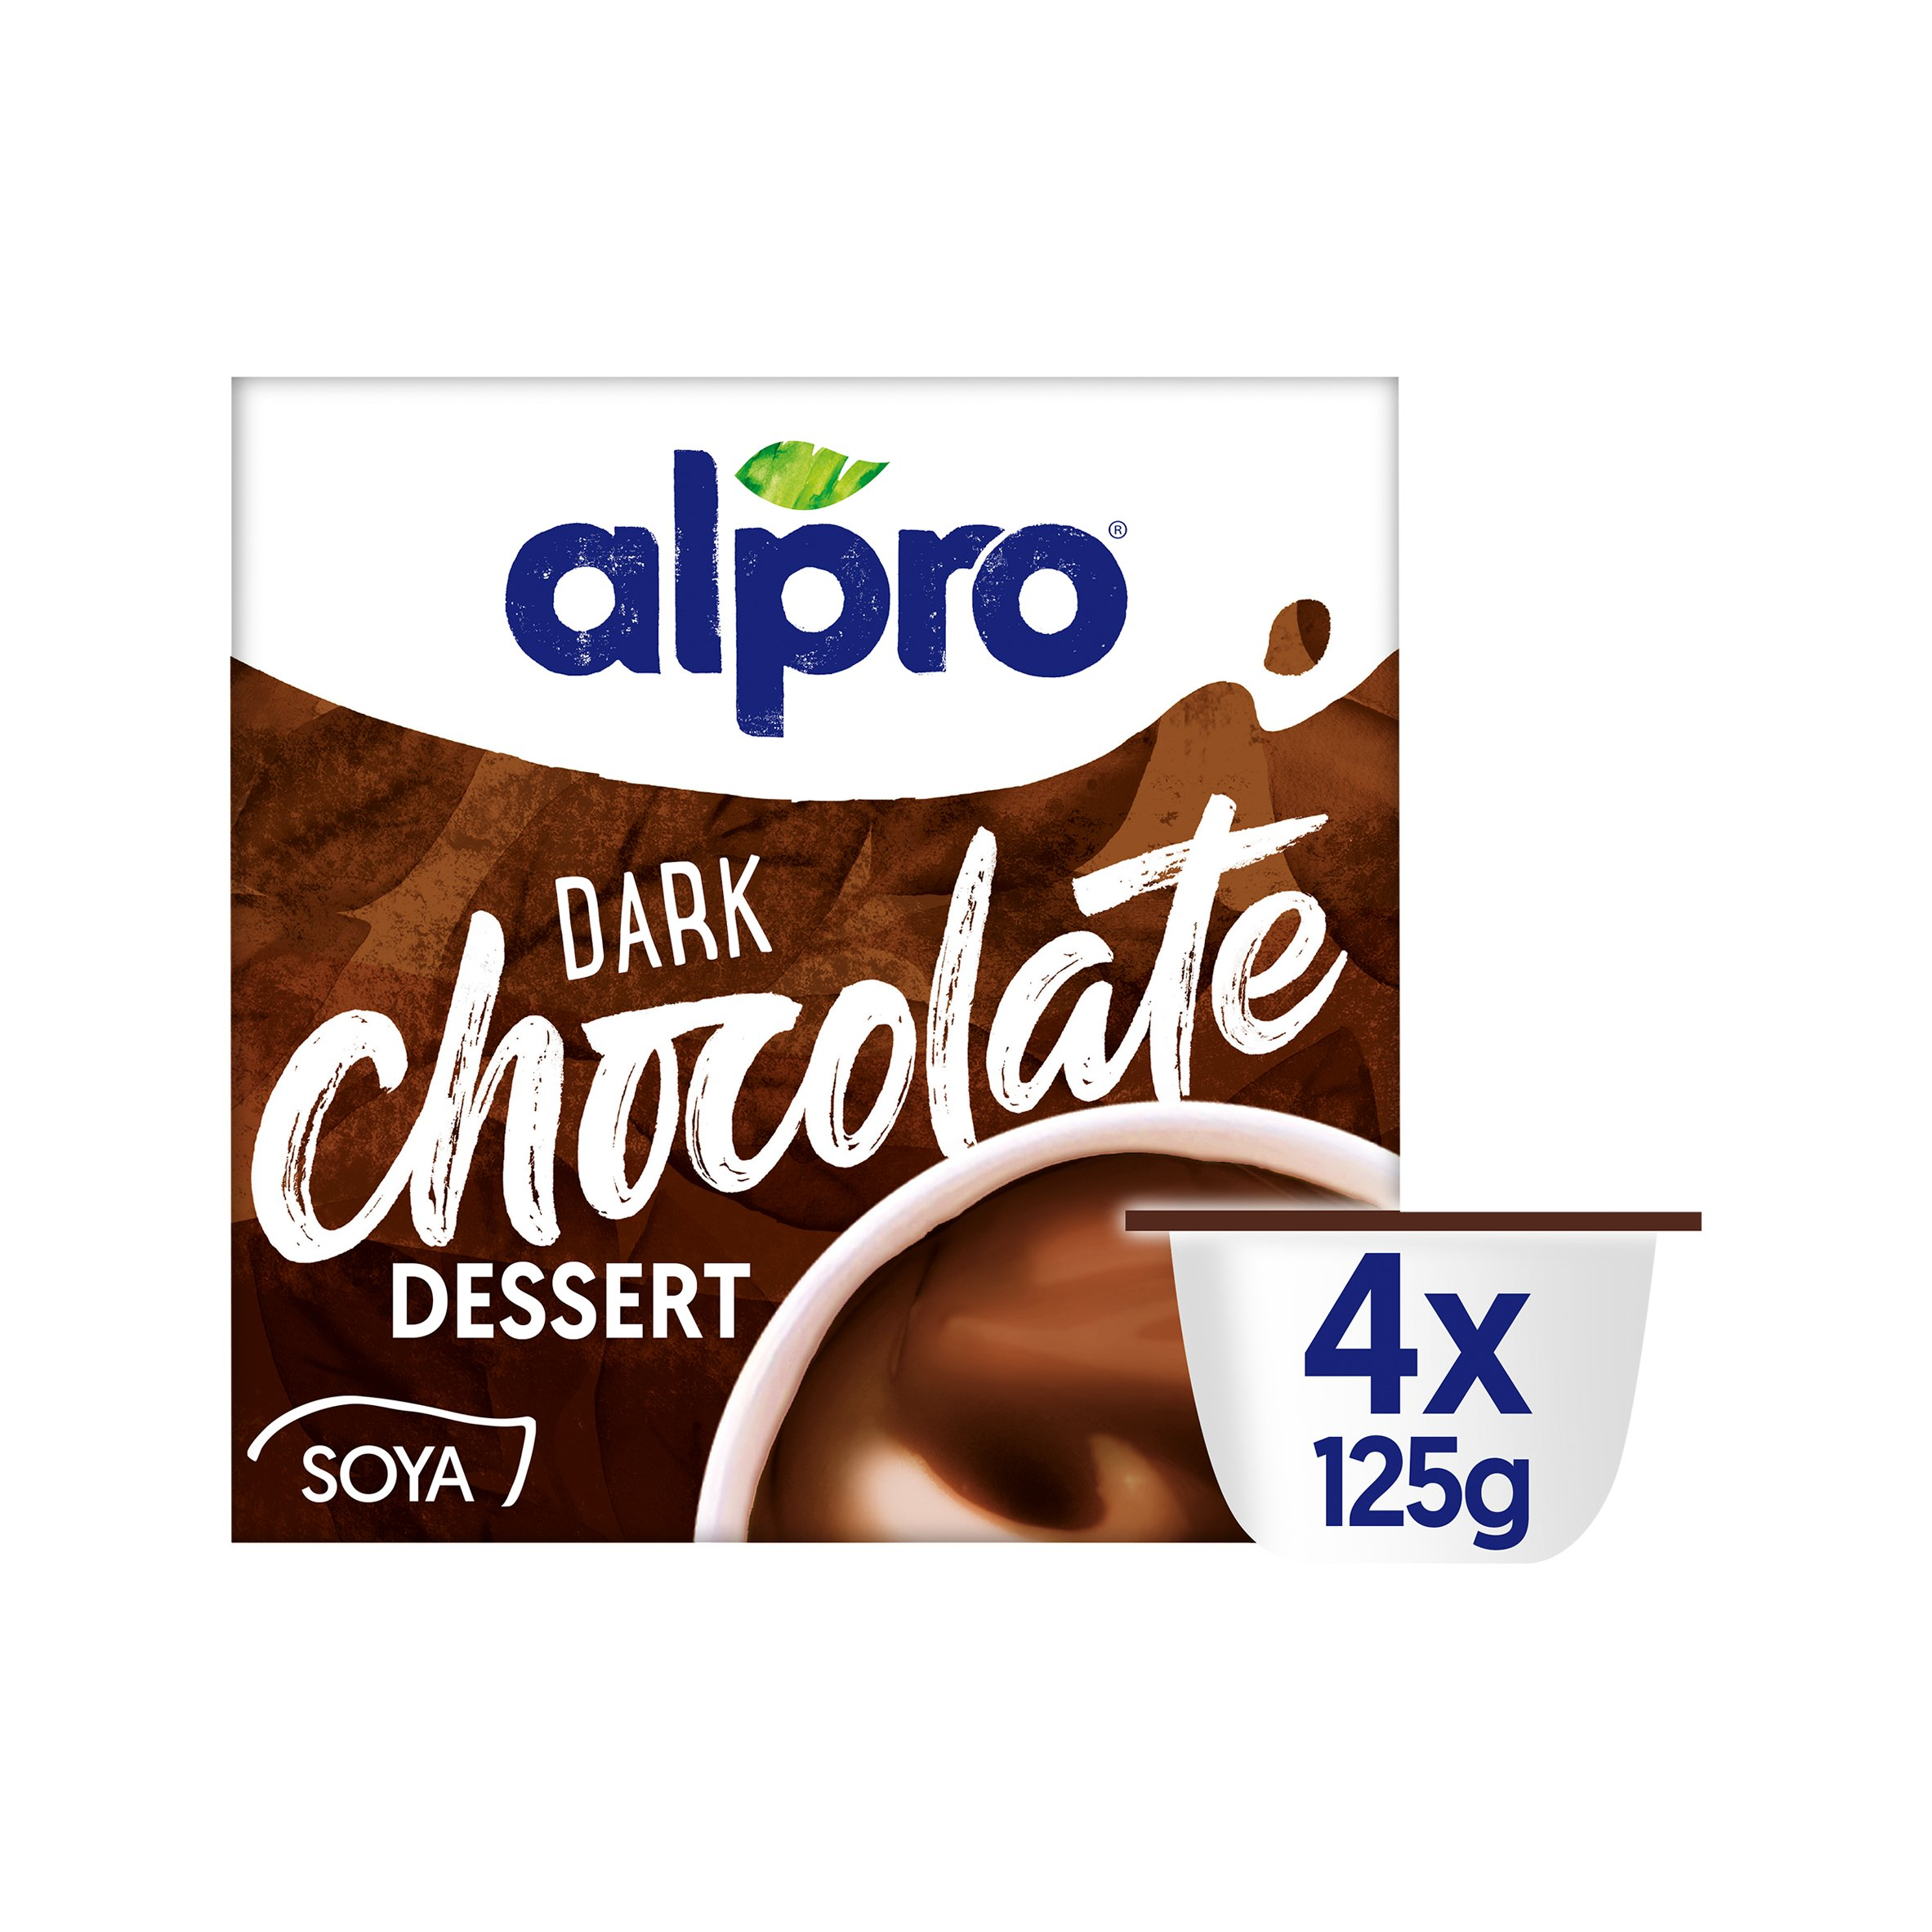 Alpro Dark Chocolate Soya Dessert 4X125g